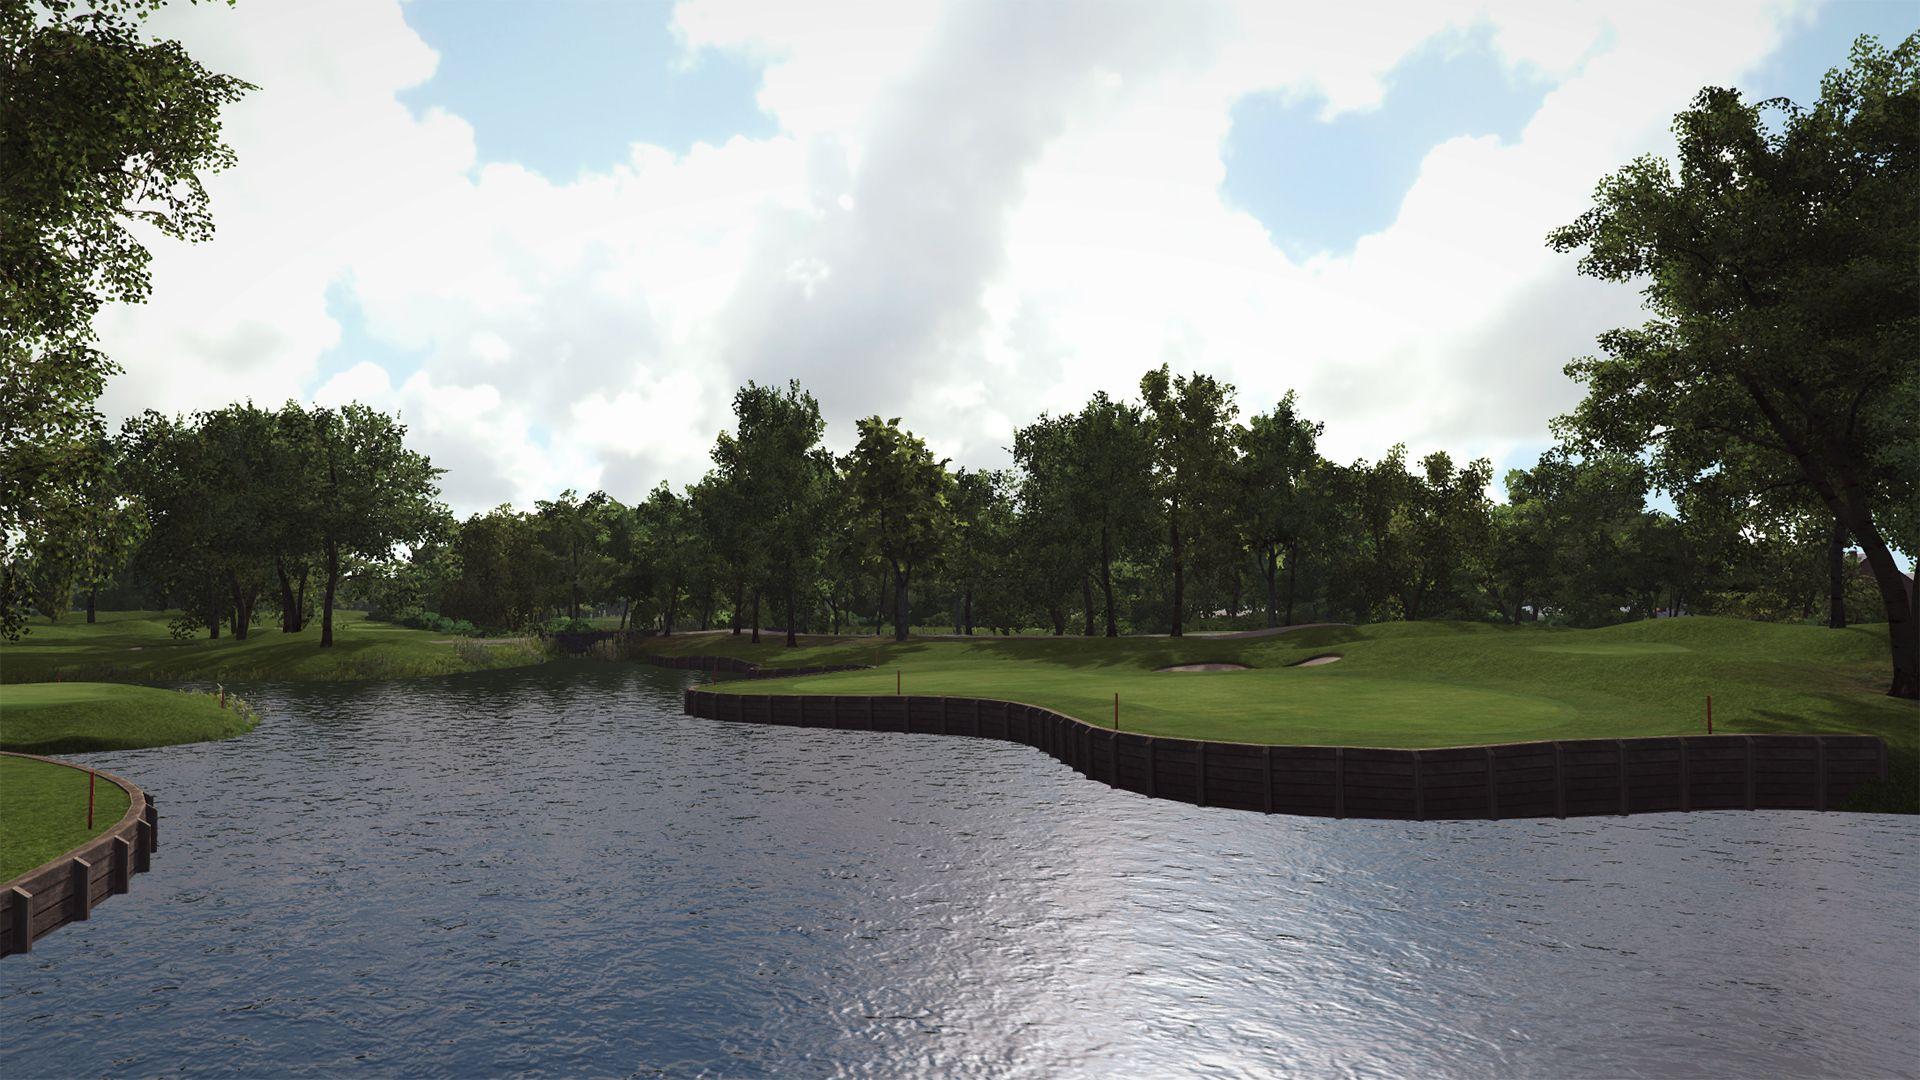 Trackman Simulator Course Kempferhof Golf Club Golf Simulators Indoor Golf Simulator Simulation